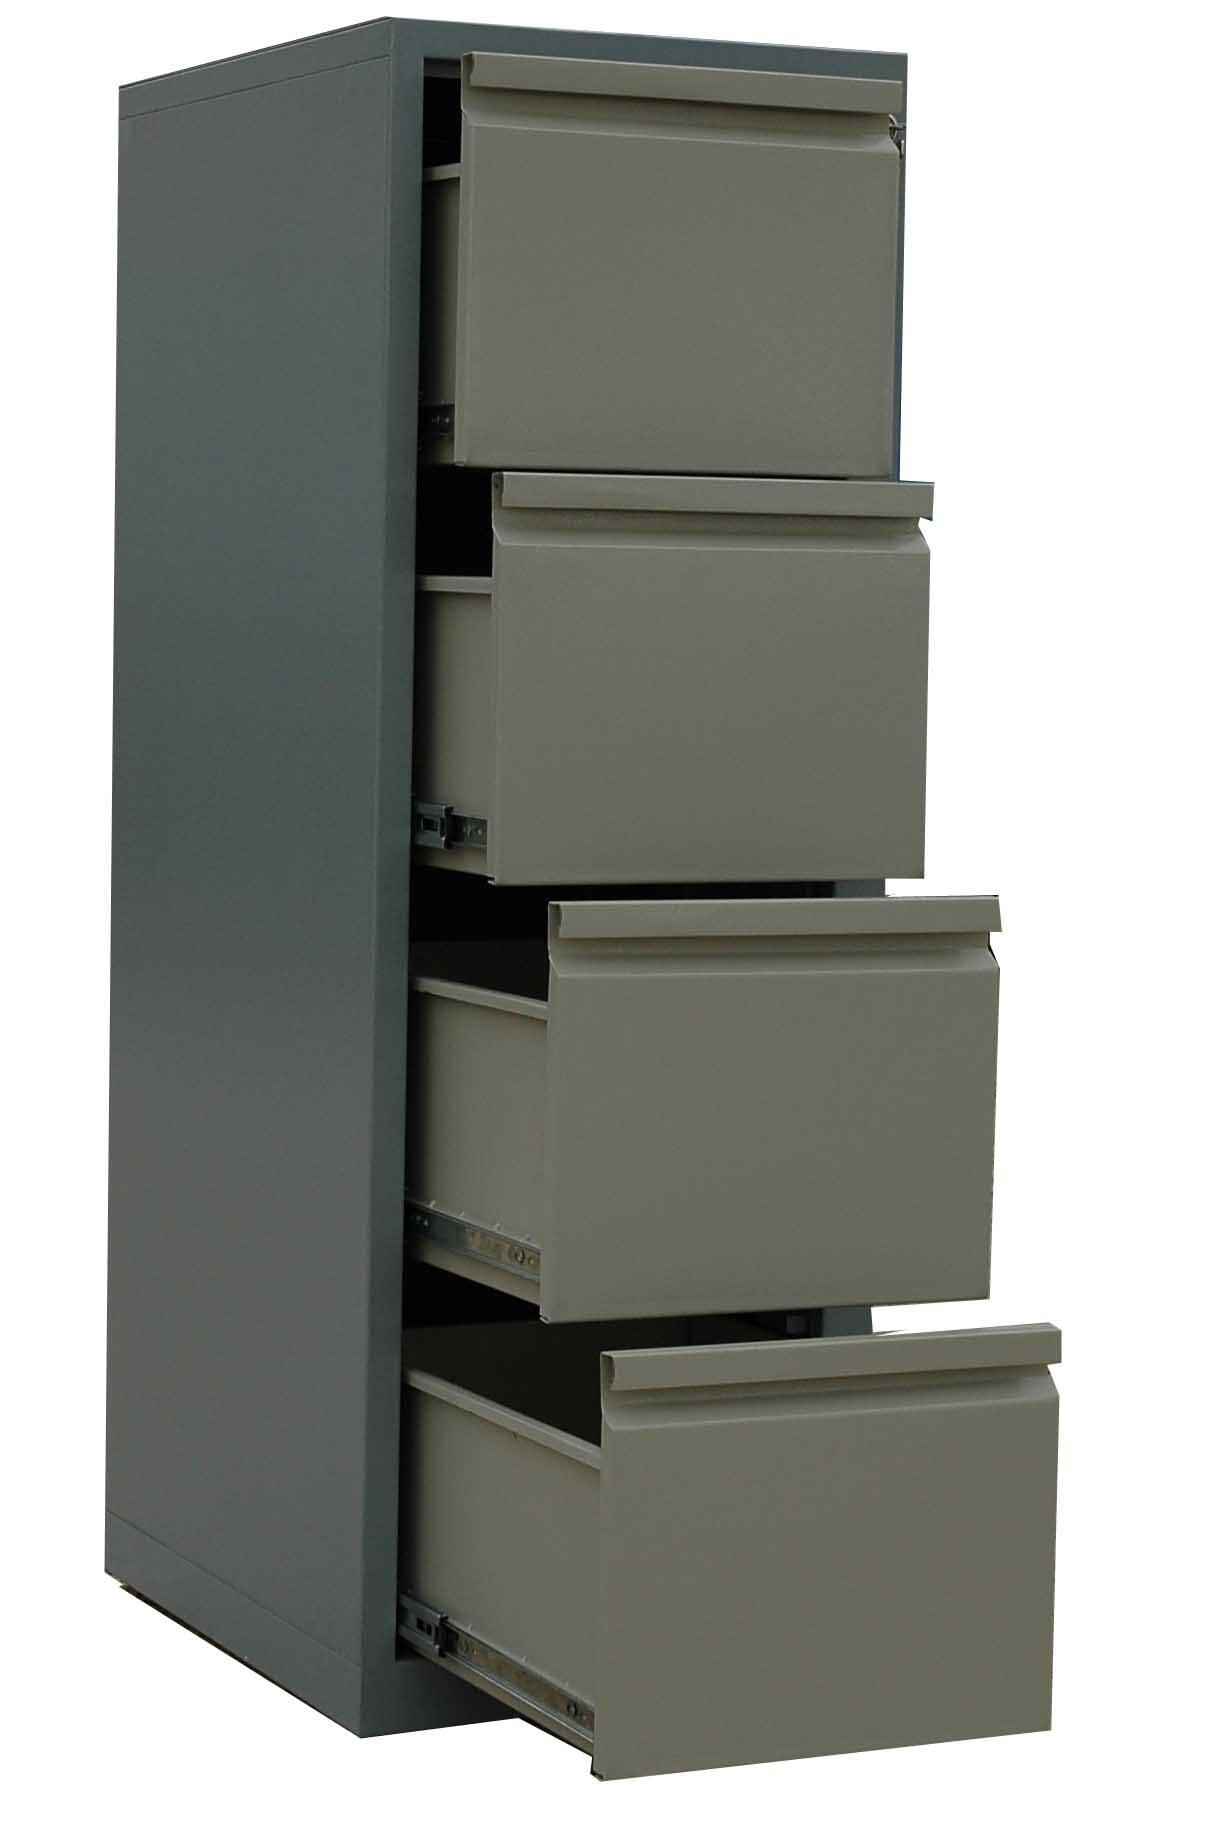 Cabina de fichero de la oficina t2 fc04as cabina de for Gabinetes para oficina